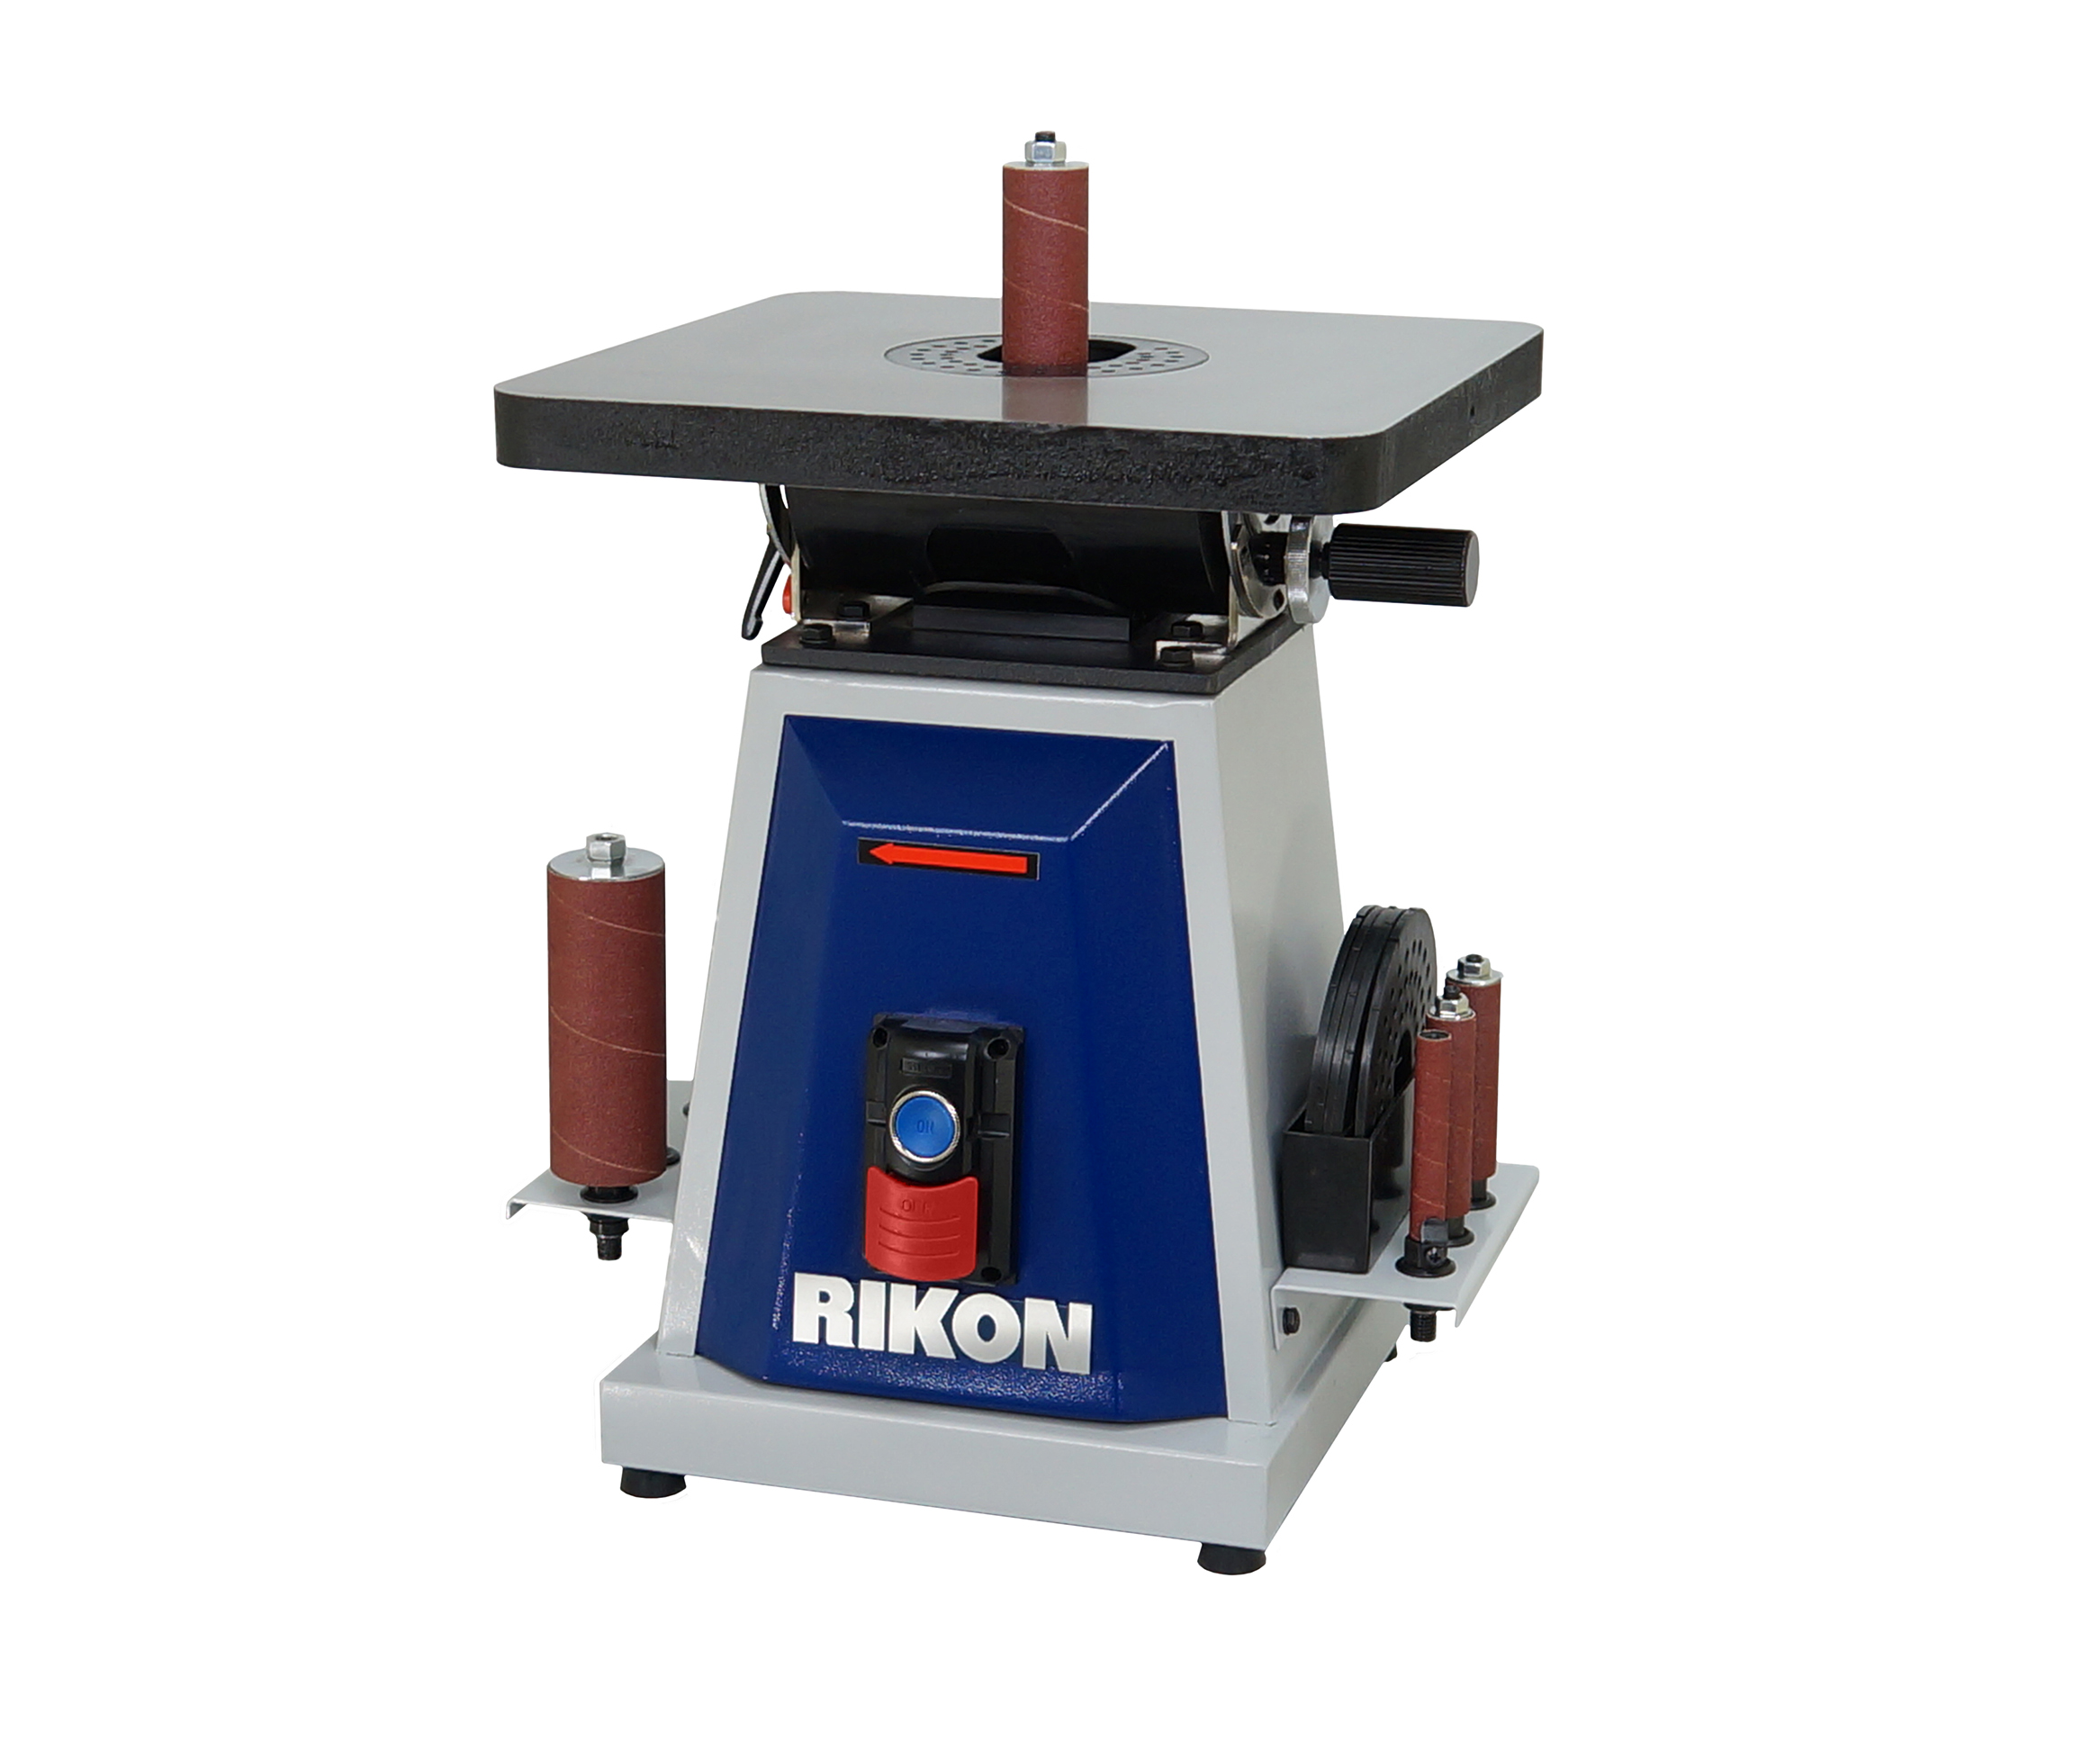 Model 50 300 Oscillating Spindle Sander Rikon Power Tools